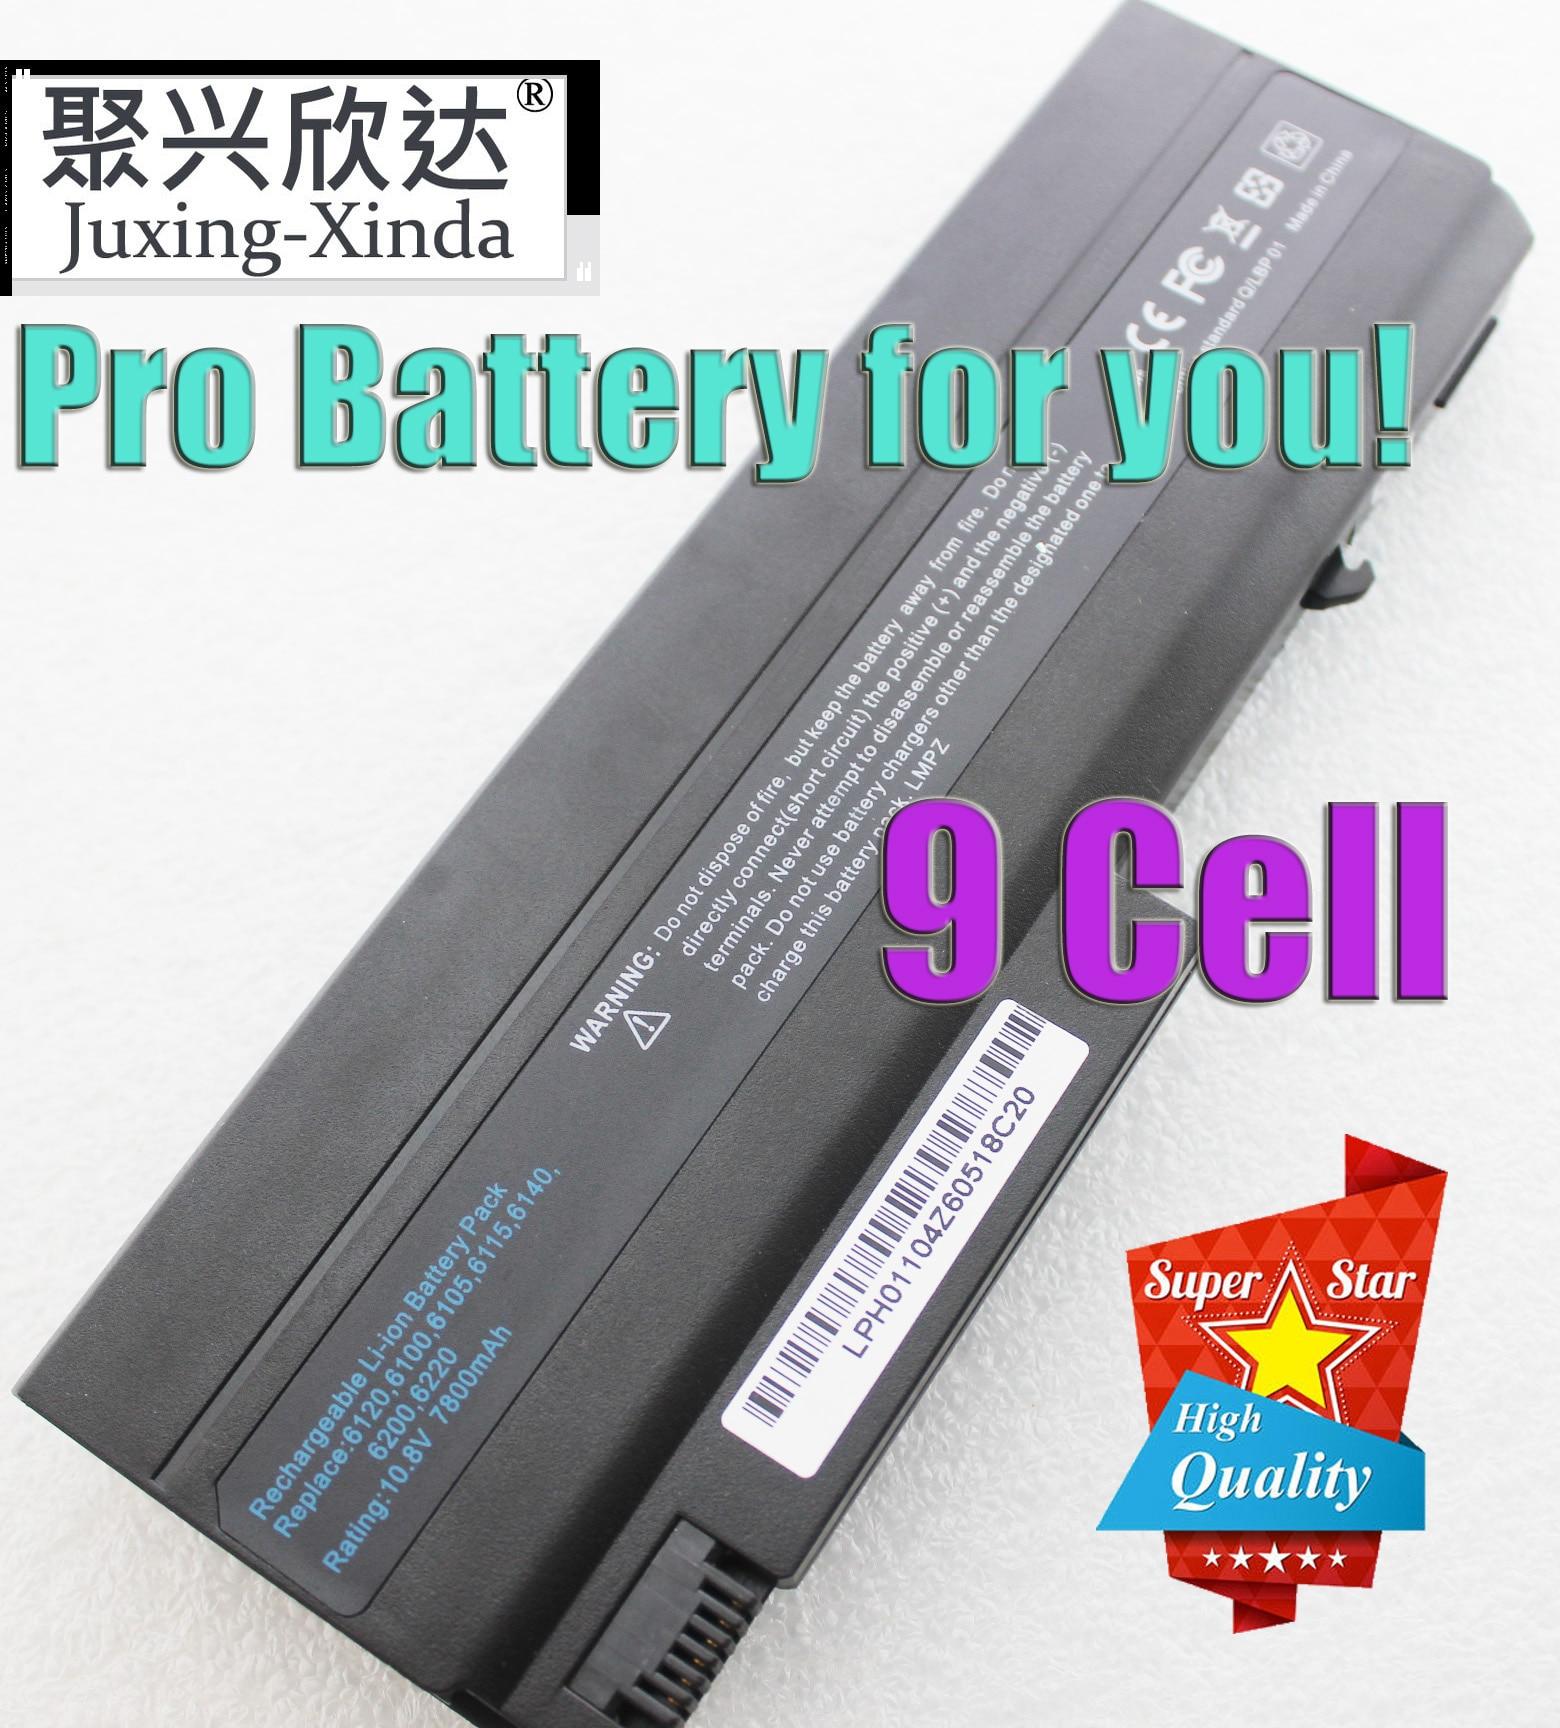 9 Bateria Do Portátil CELULAR Para Hp Compaq 6910p 6510b 6515b 6710b 6710s 6715b 6715s NC6105 NC6110 nc6120 nx6125 nx6130 nx6140 nx6310 PC